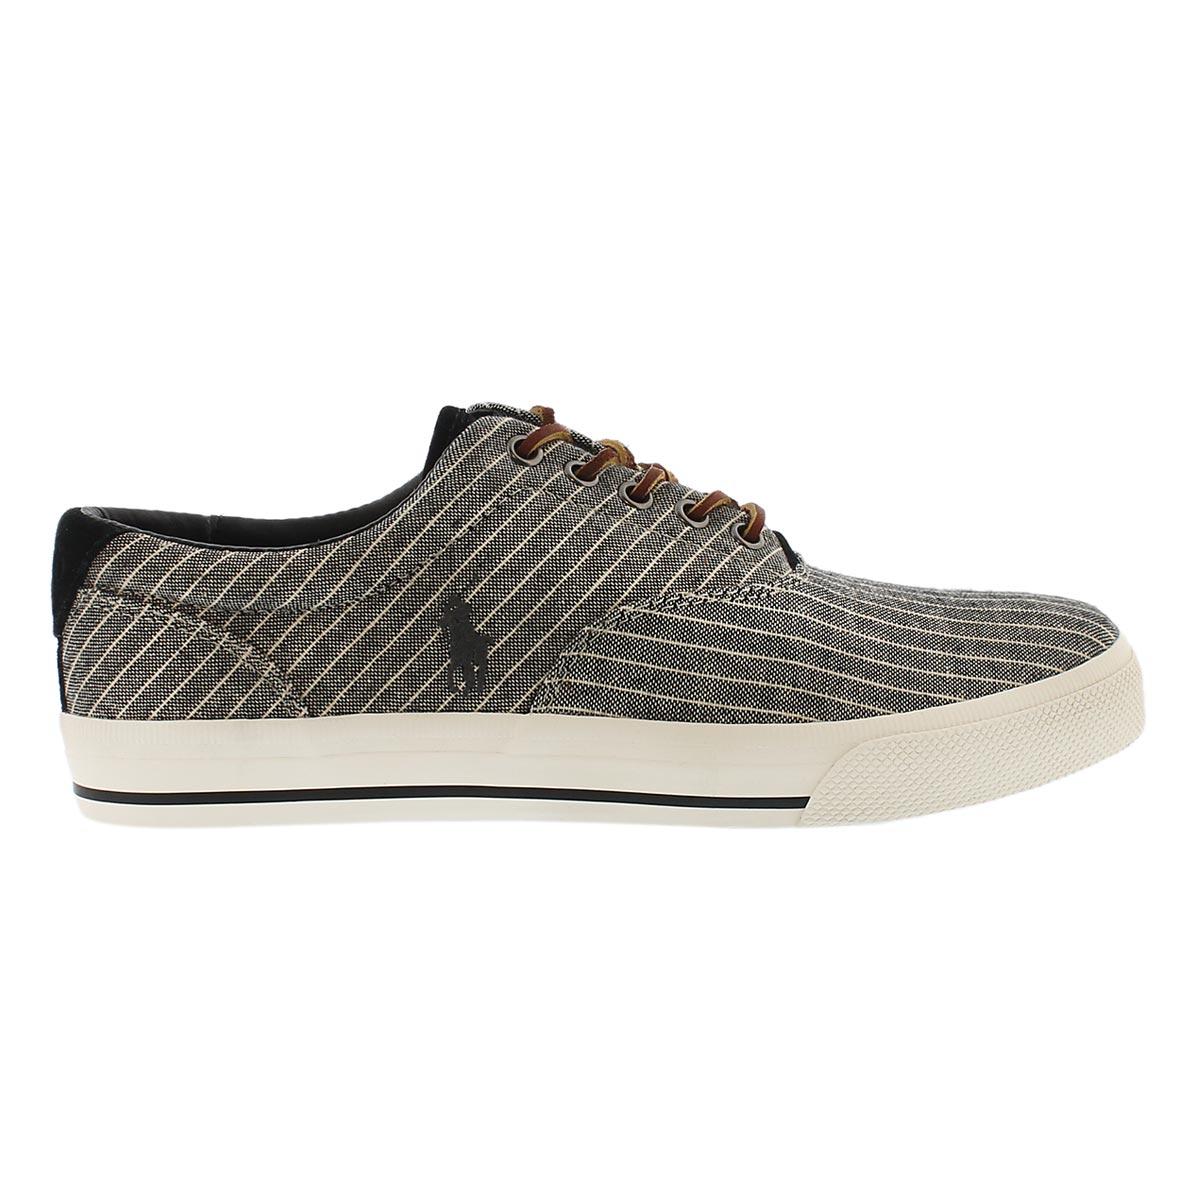 Mns Vaughn black striped canvas sneaker